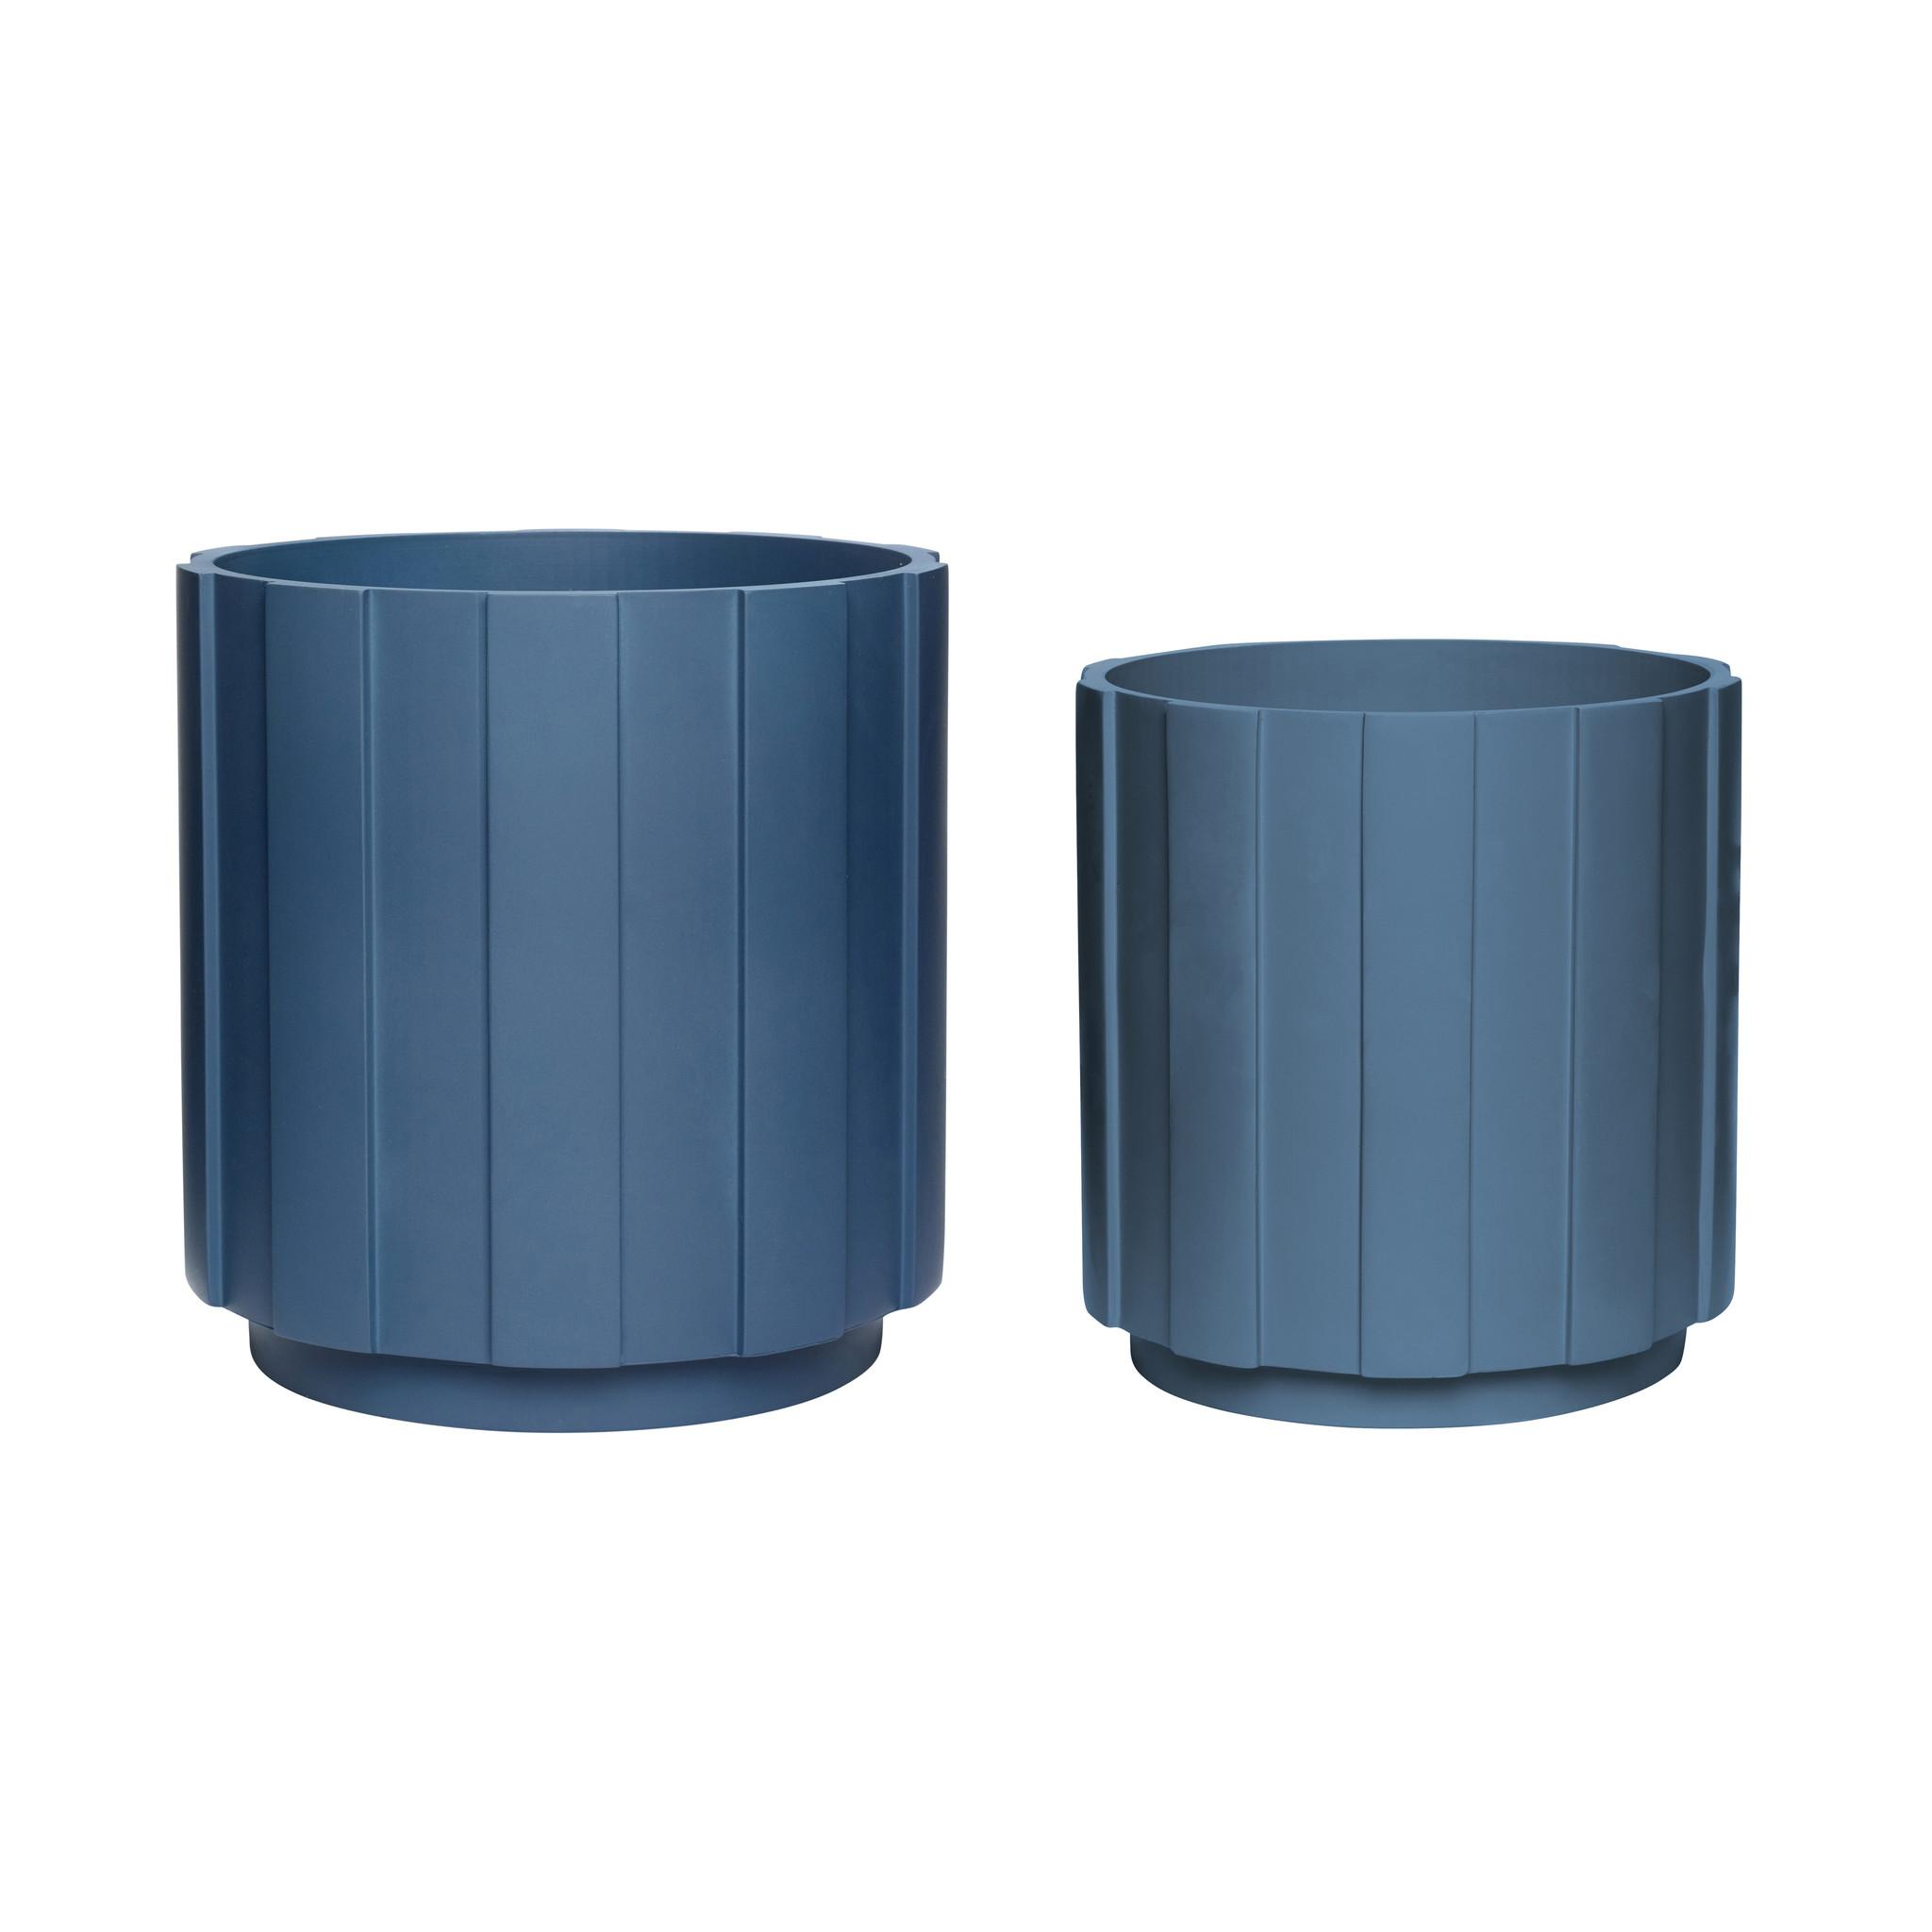 Hubsch Potten, gips, petrolblauw, set van 2